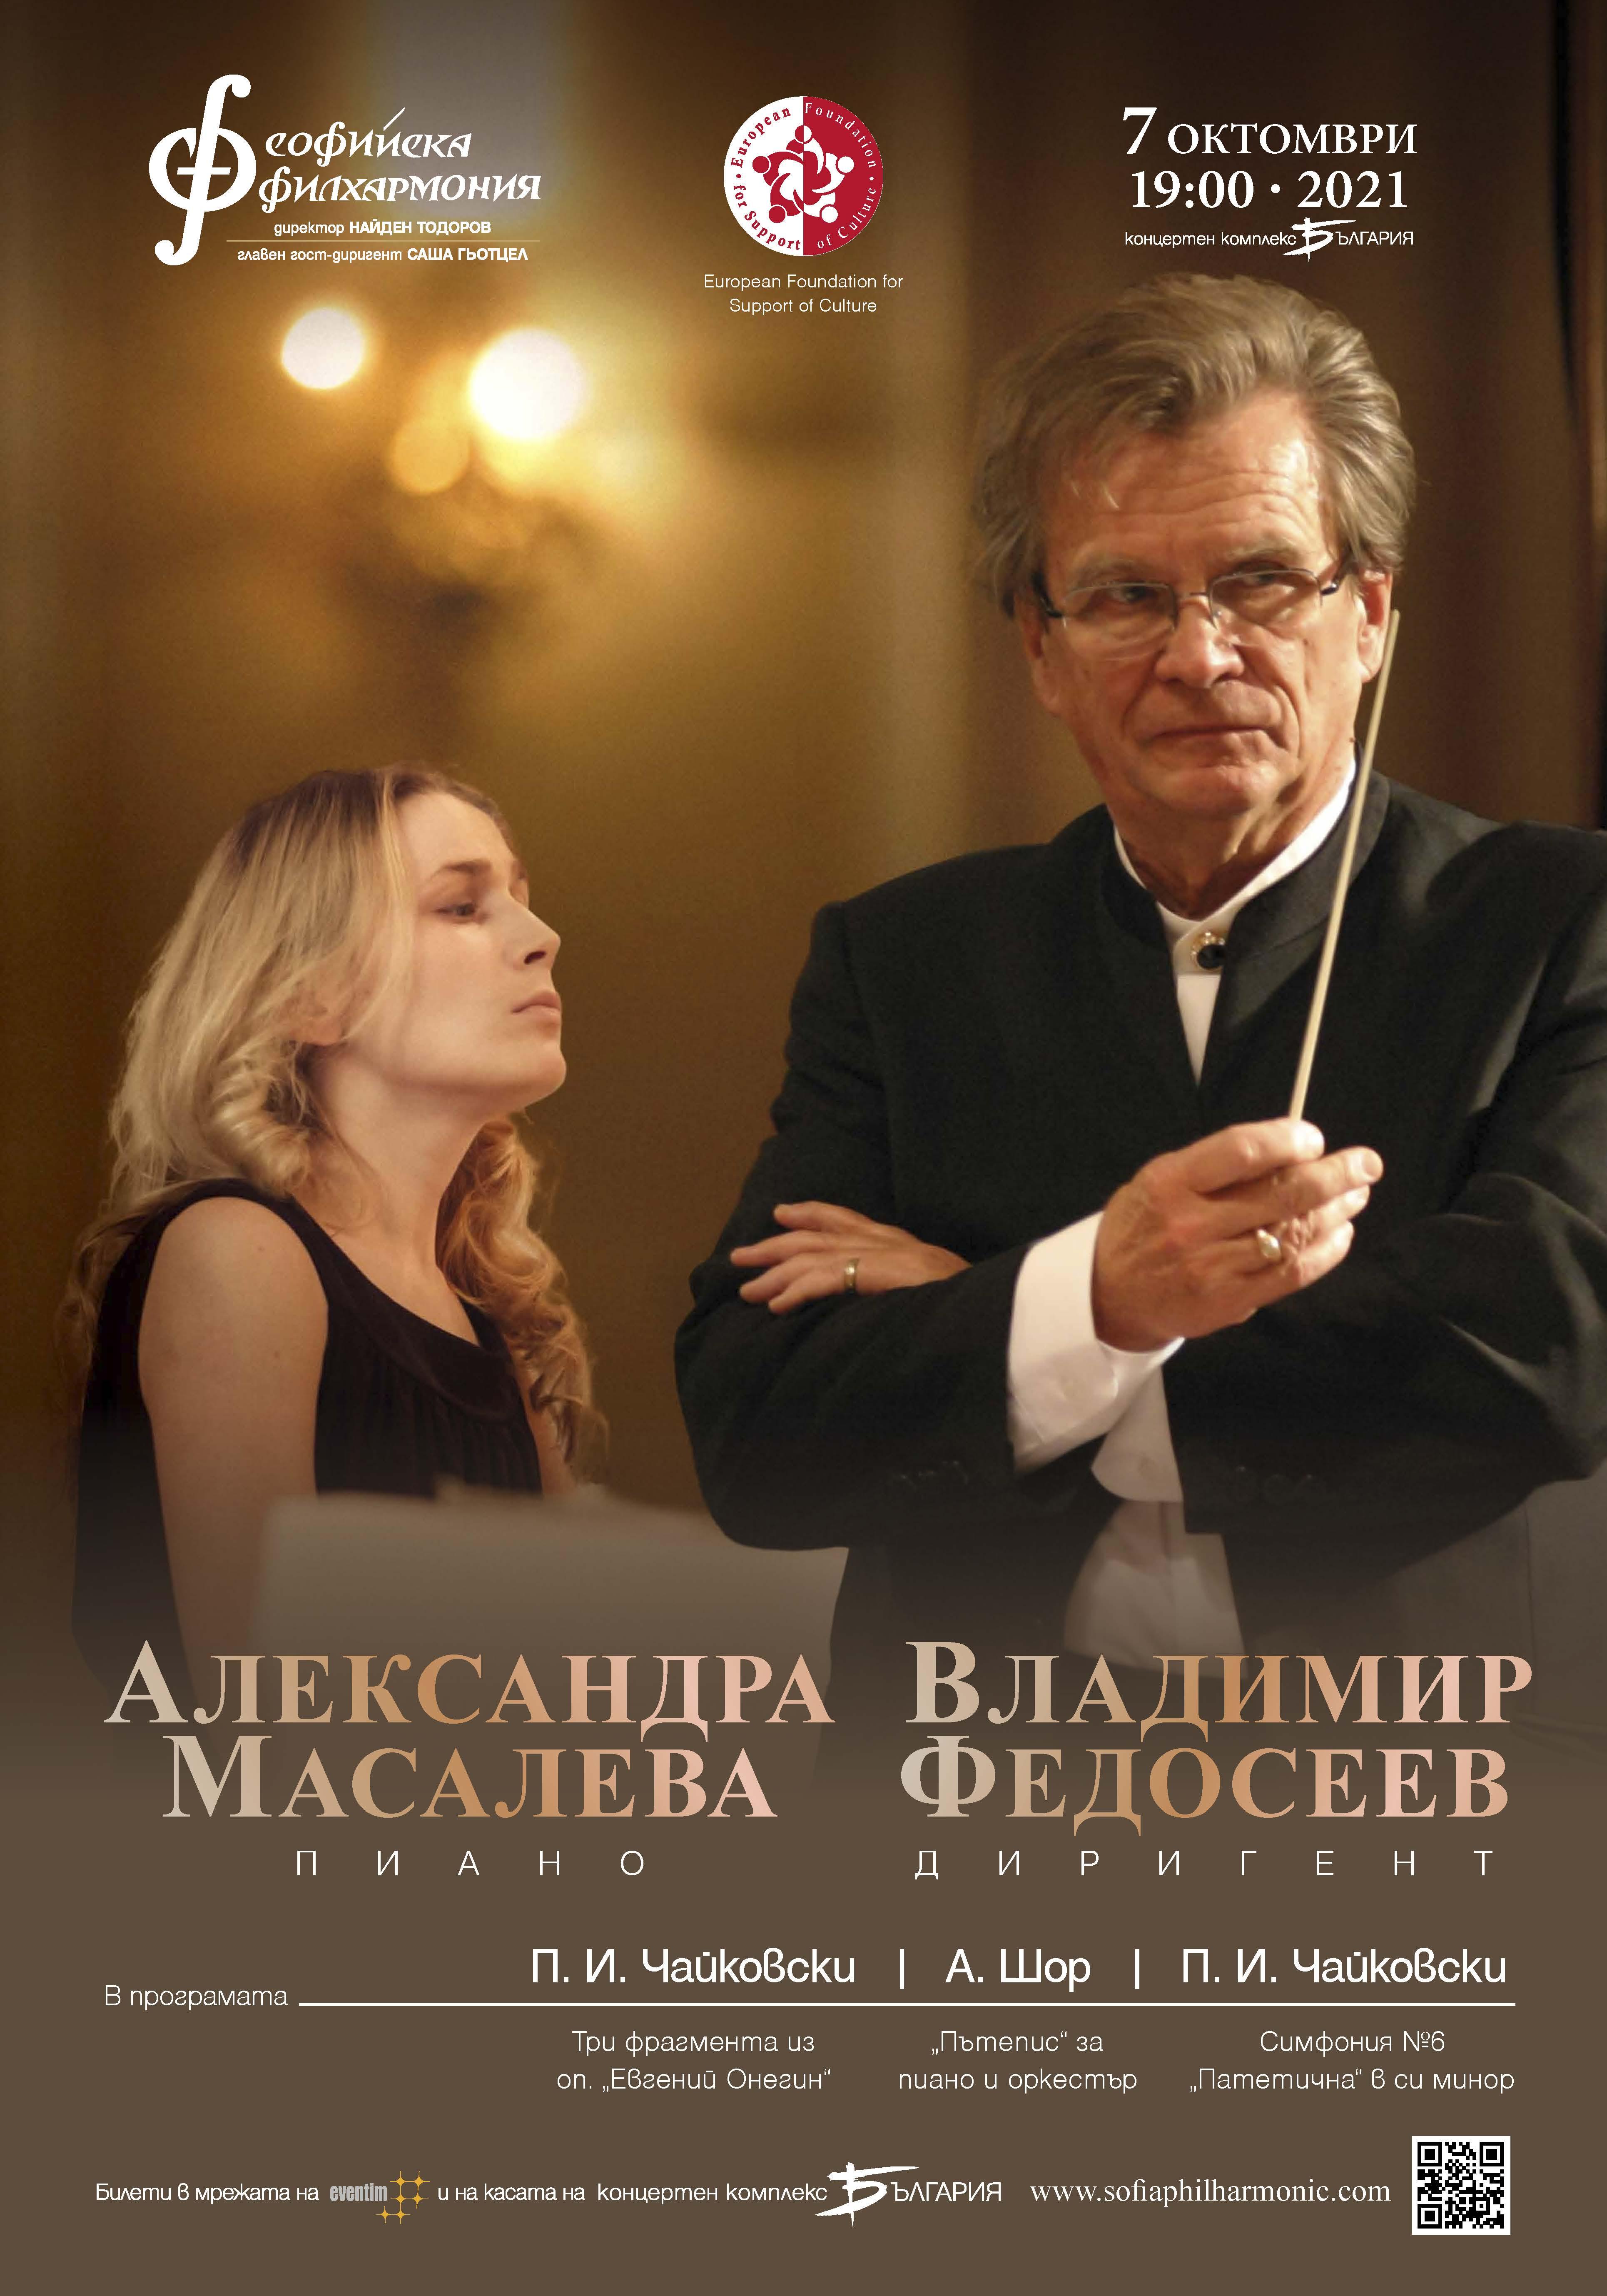 7.10.2021 Fedoseyev Masaleva Preview